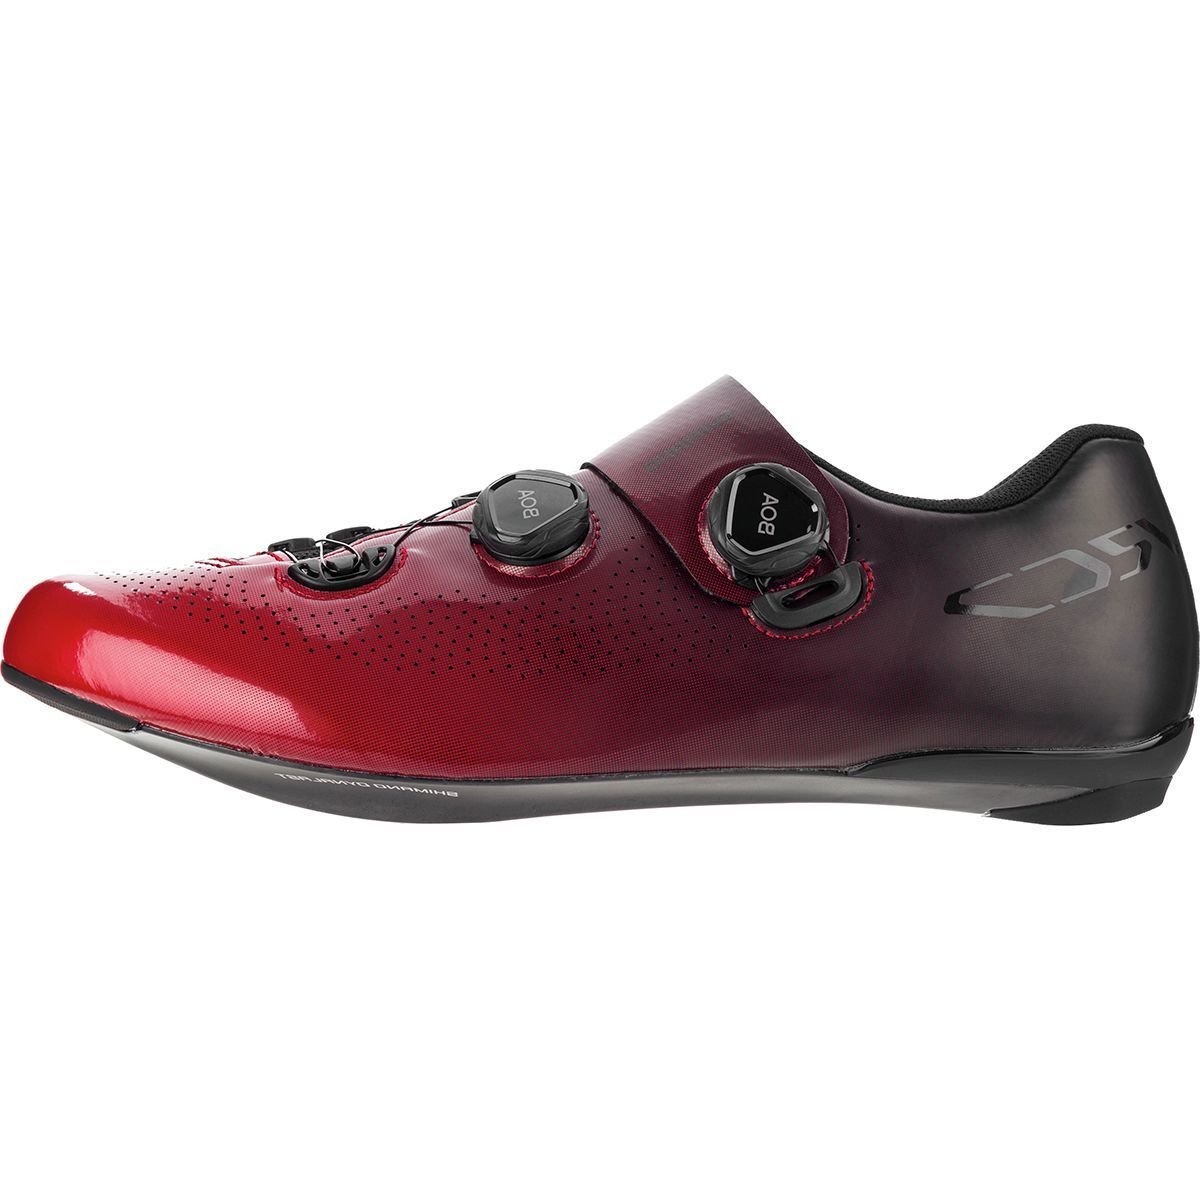 Shimano SH-RC7 Limited Edition Wide Cycling Shoe - Men's